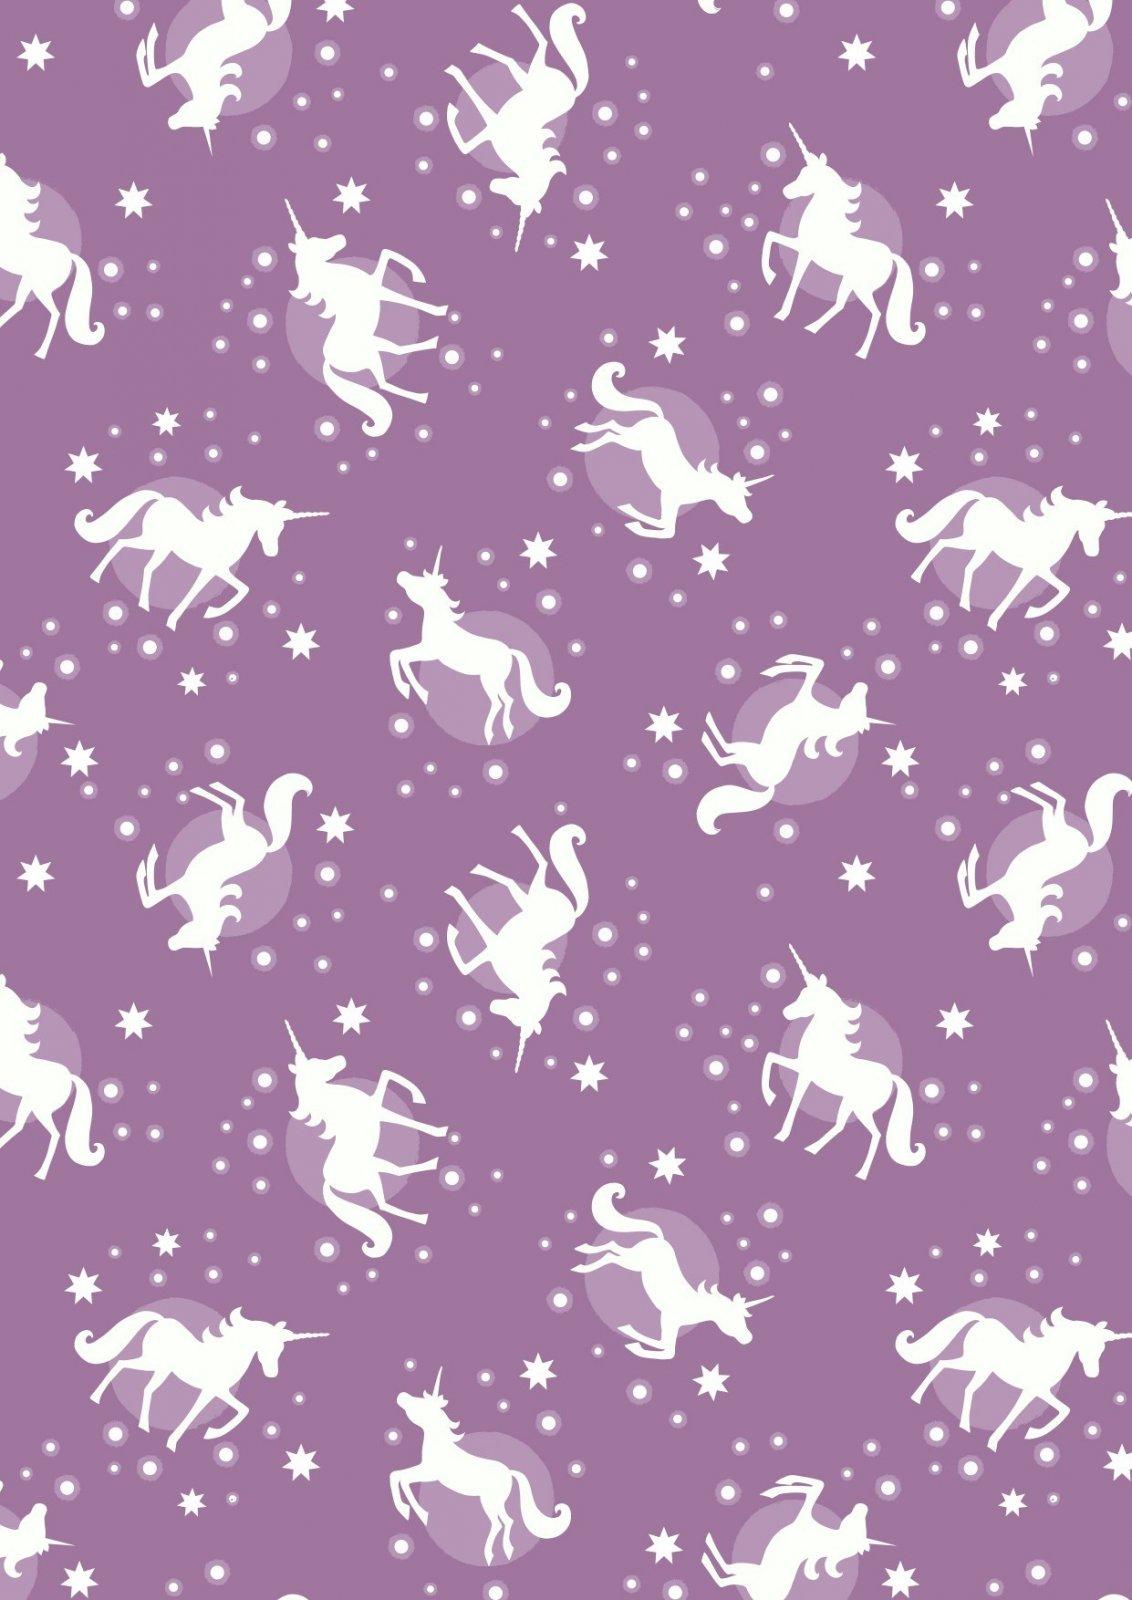 Fairy Nights Glow in the Dark - Unicorn Spots on Soft Blackberry